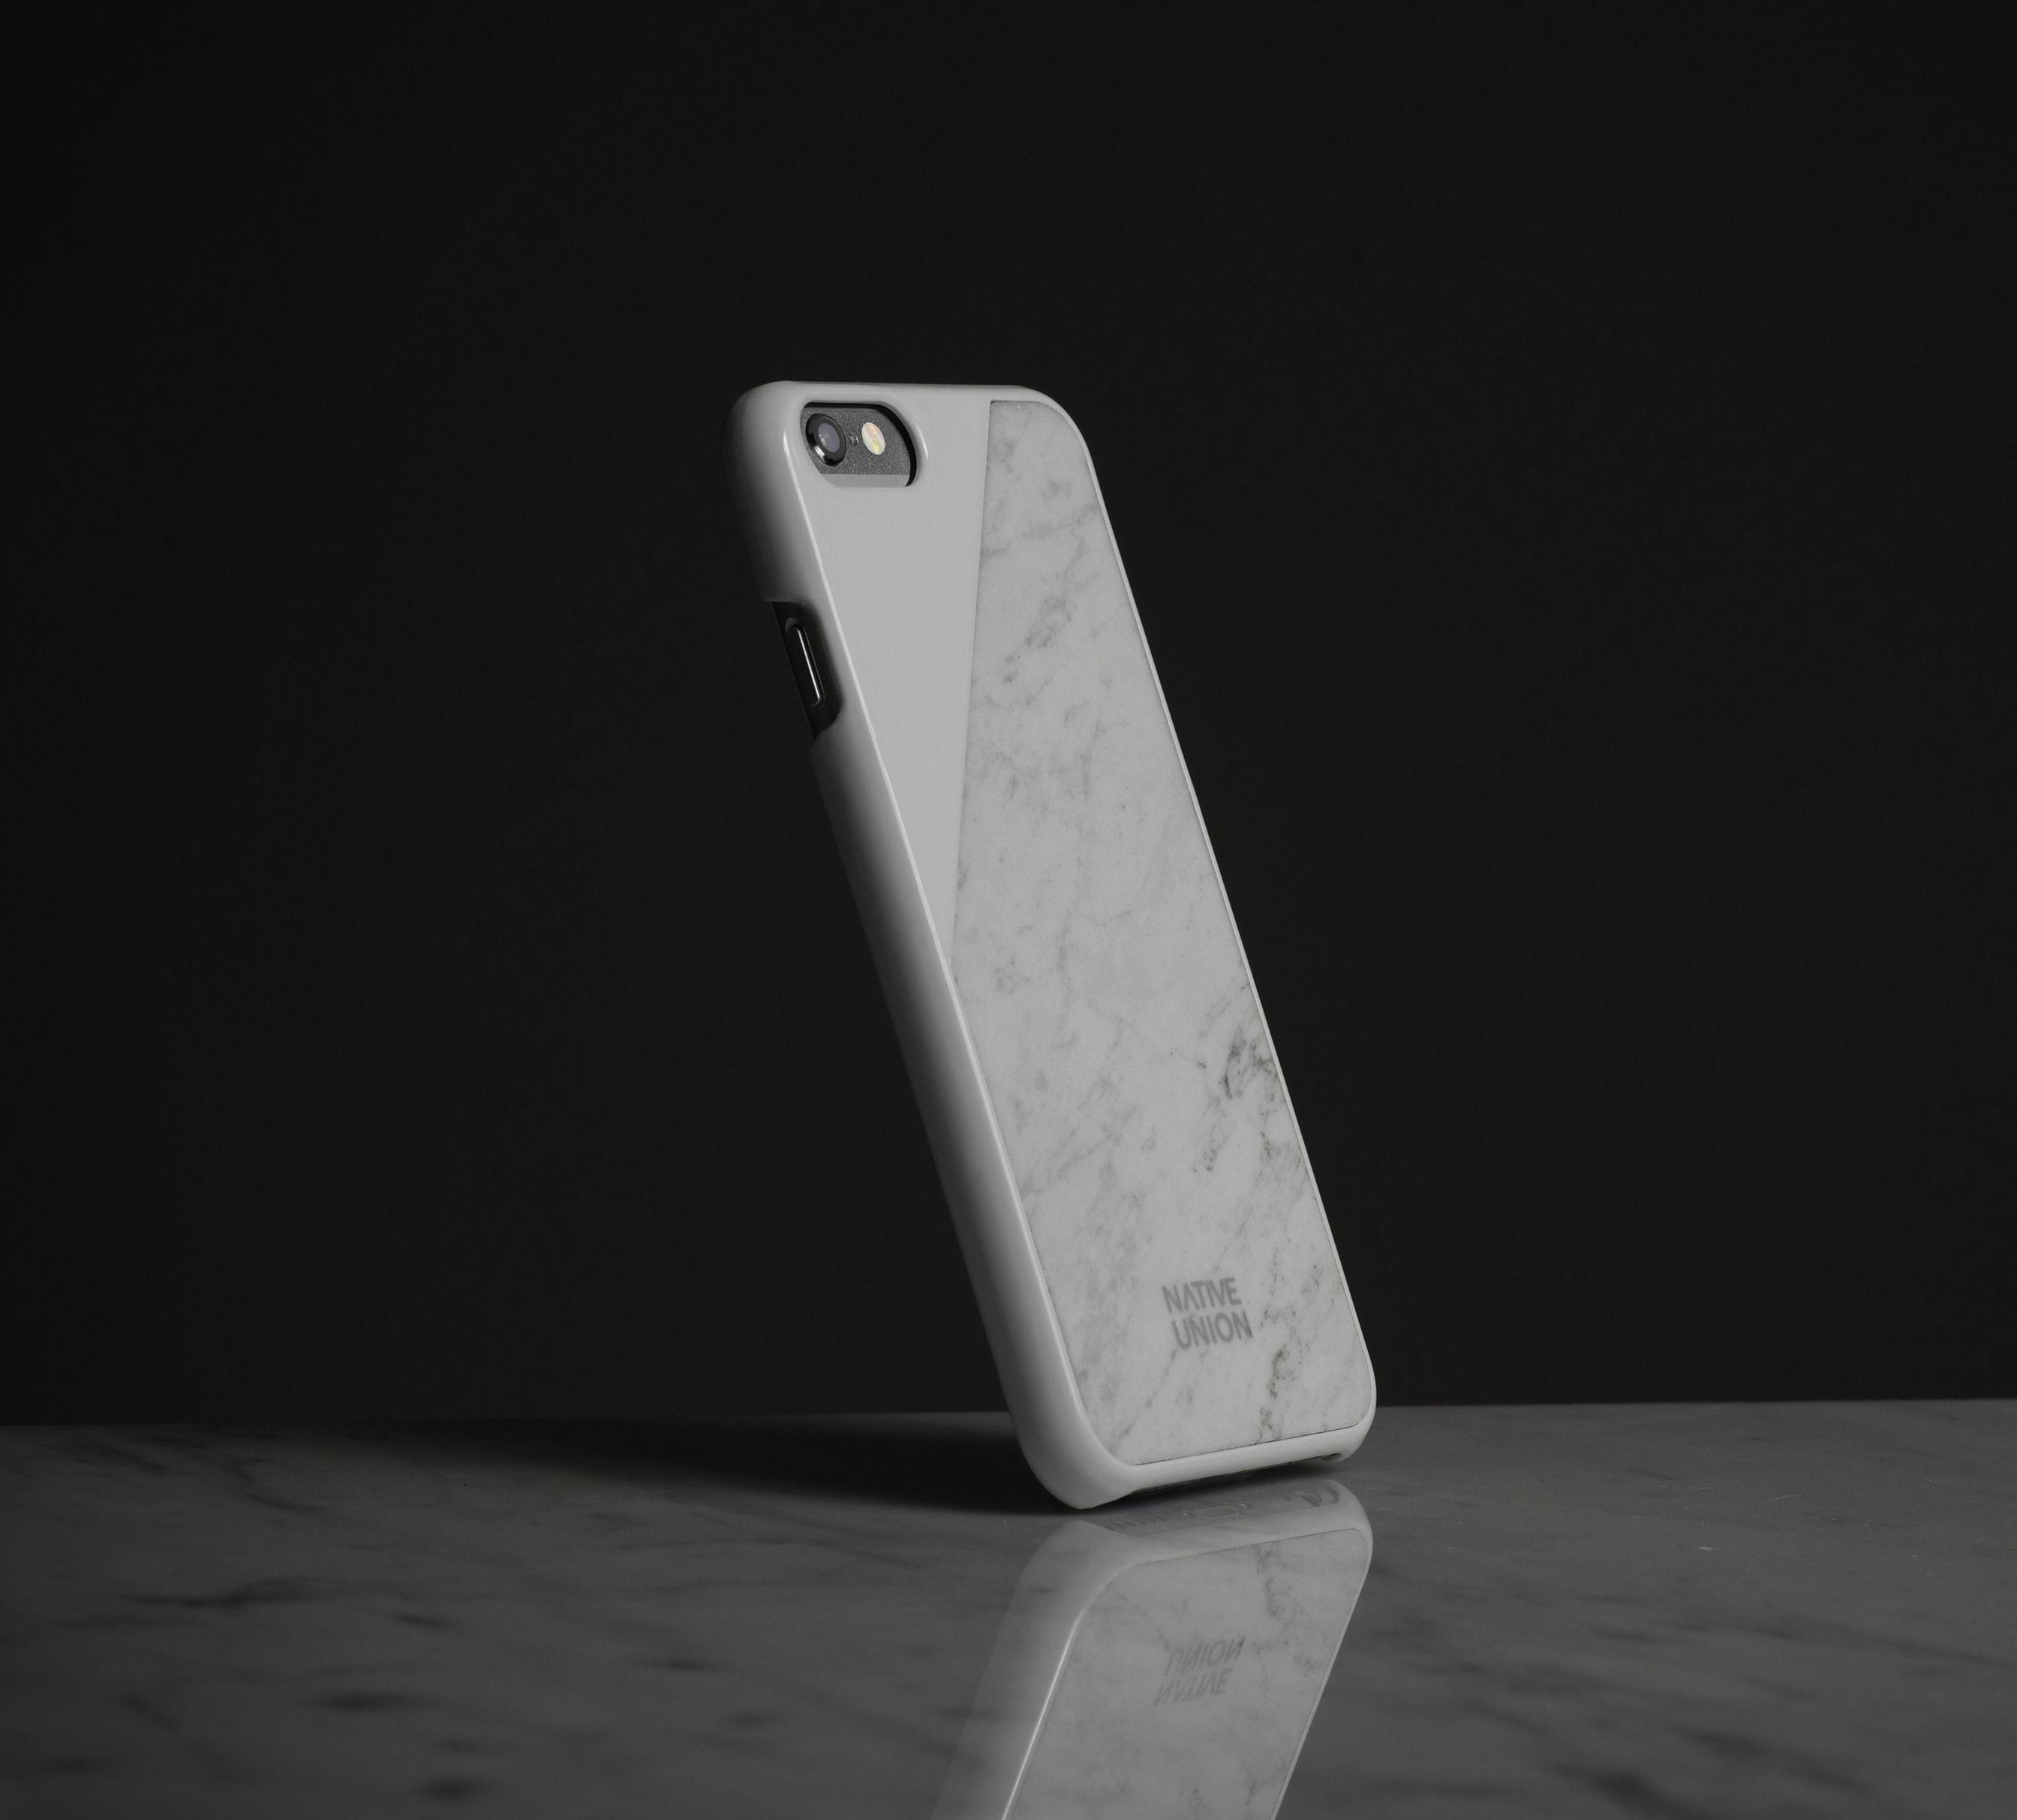 coque iphone 6 clic marble marbre v ritable blanc marbre blanc native union. Black Bedroom Furniture Sets. Home Design Ideas